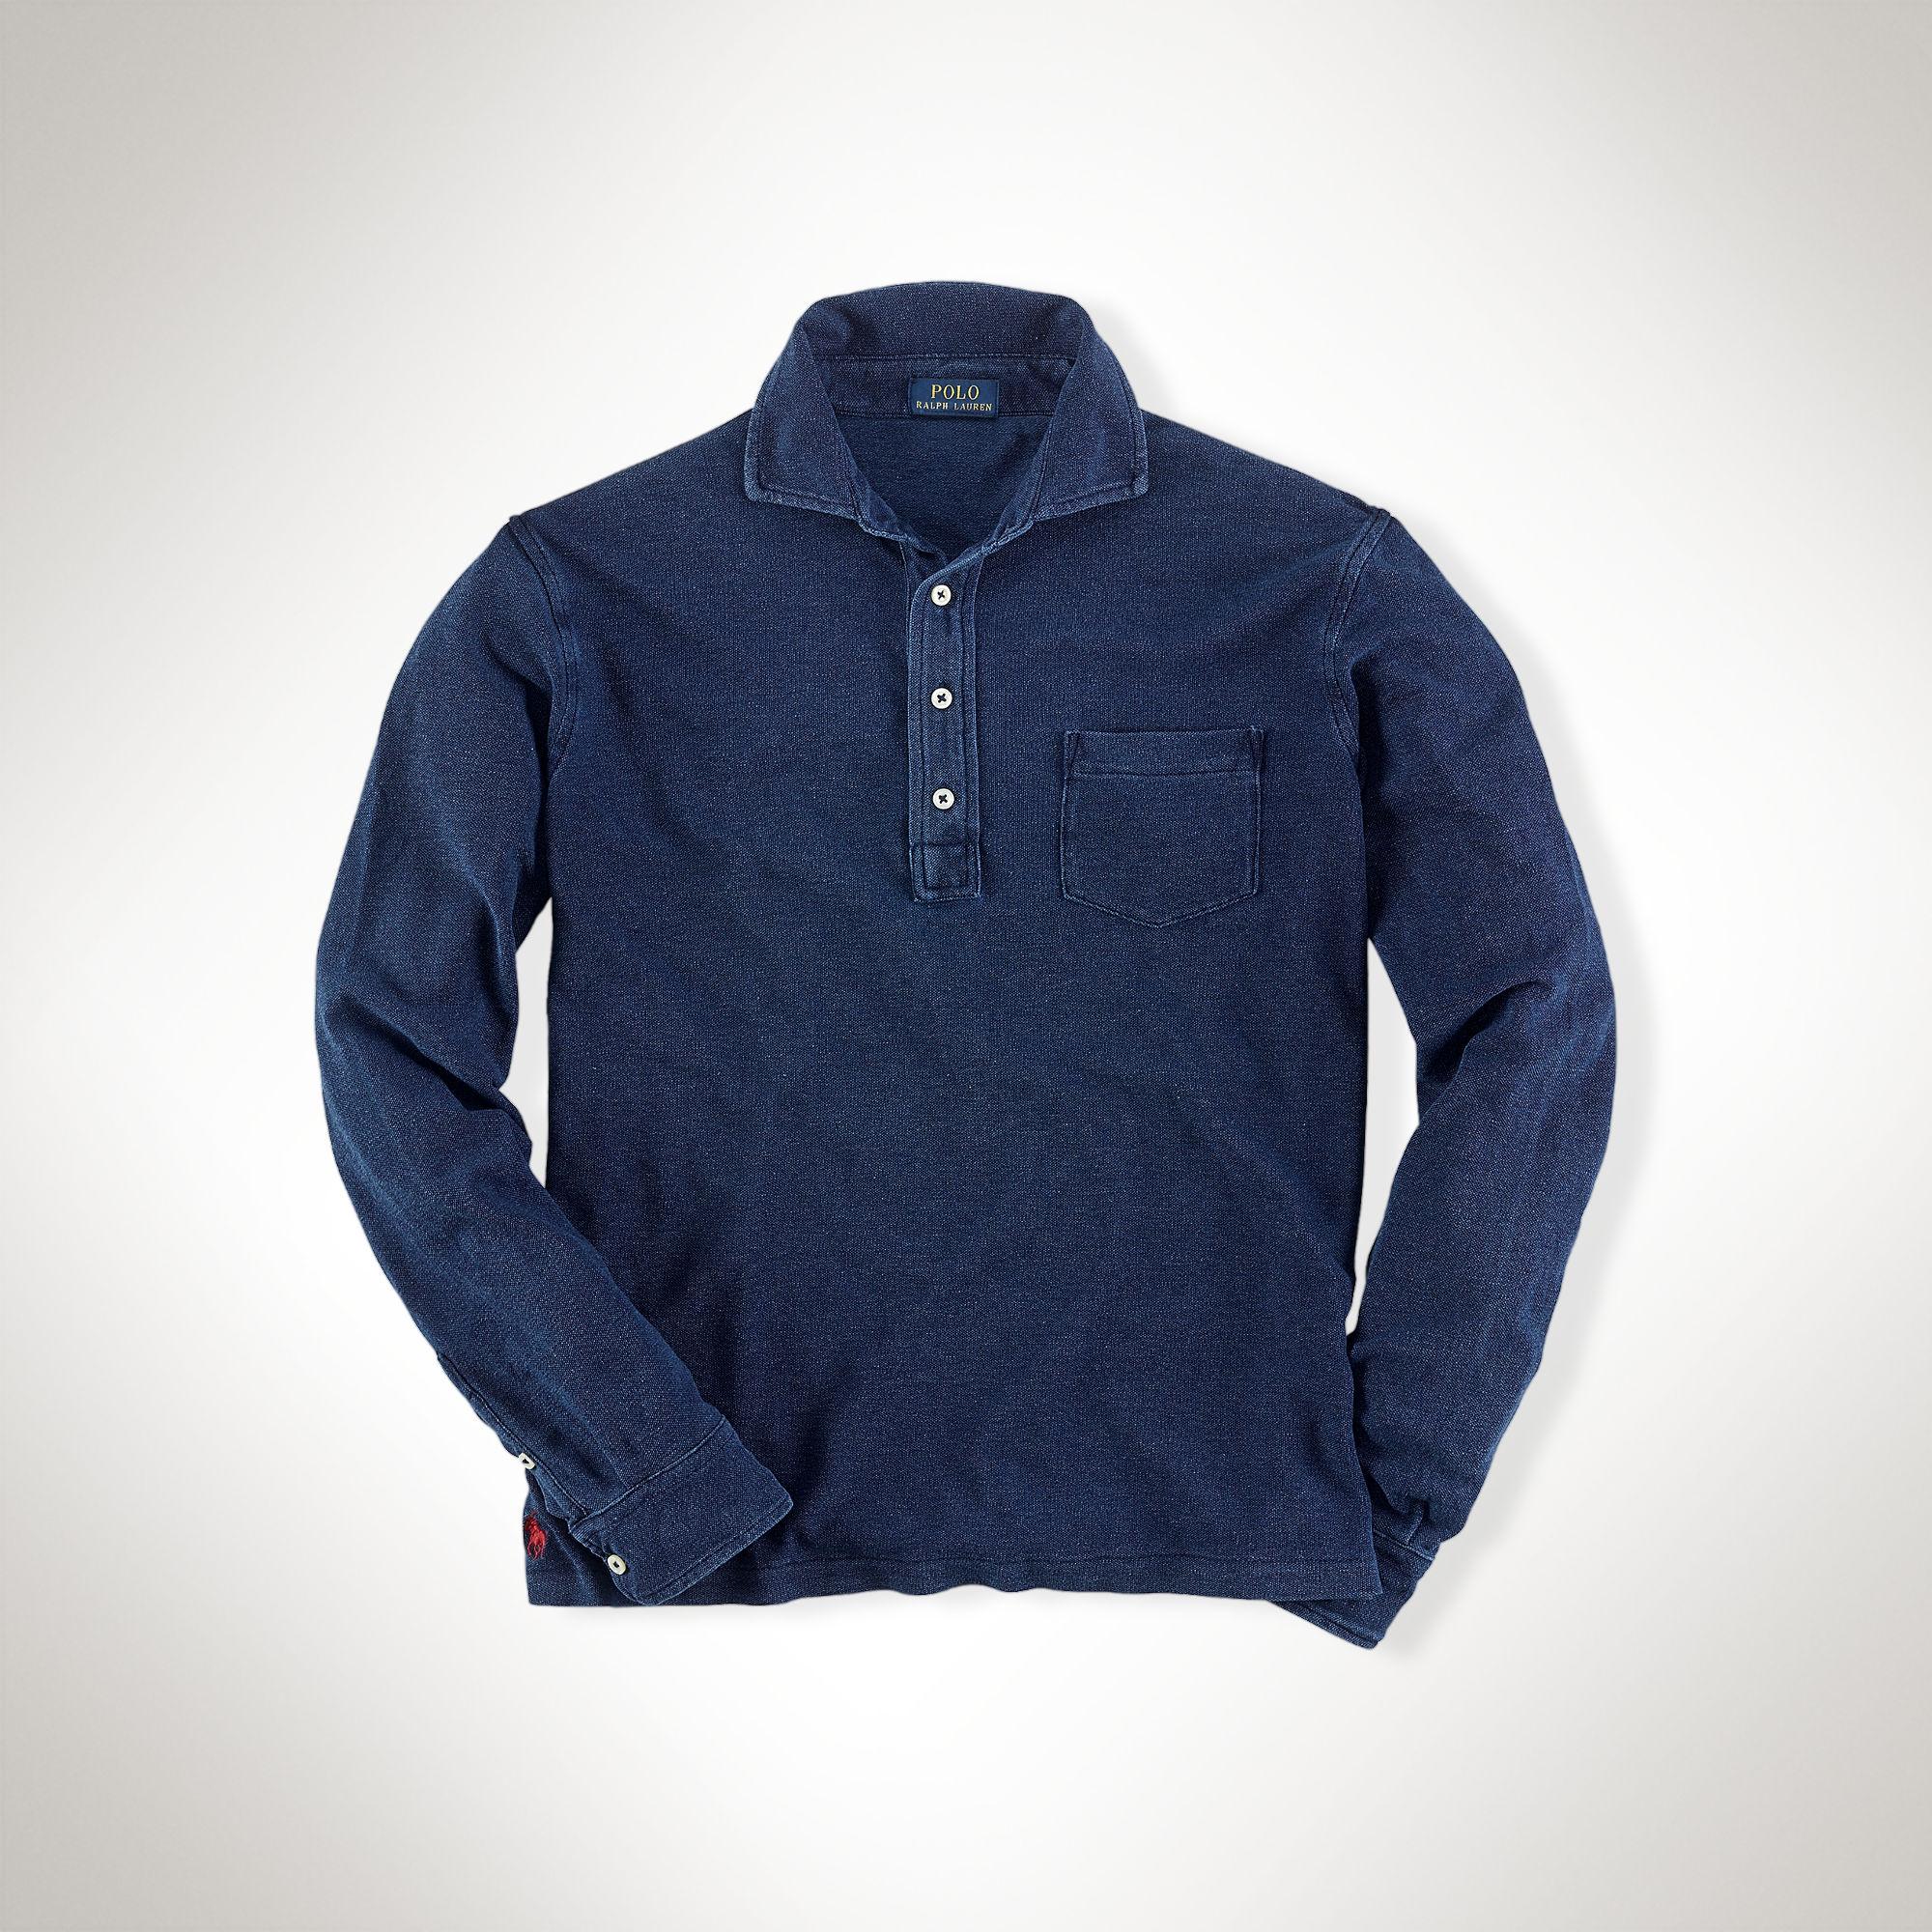 840dafc2b0d Polo Ralph Lauren Featherweight Mesh Polo Shirt in Blue for Men - Lyst